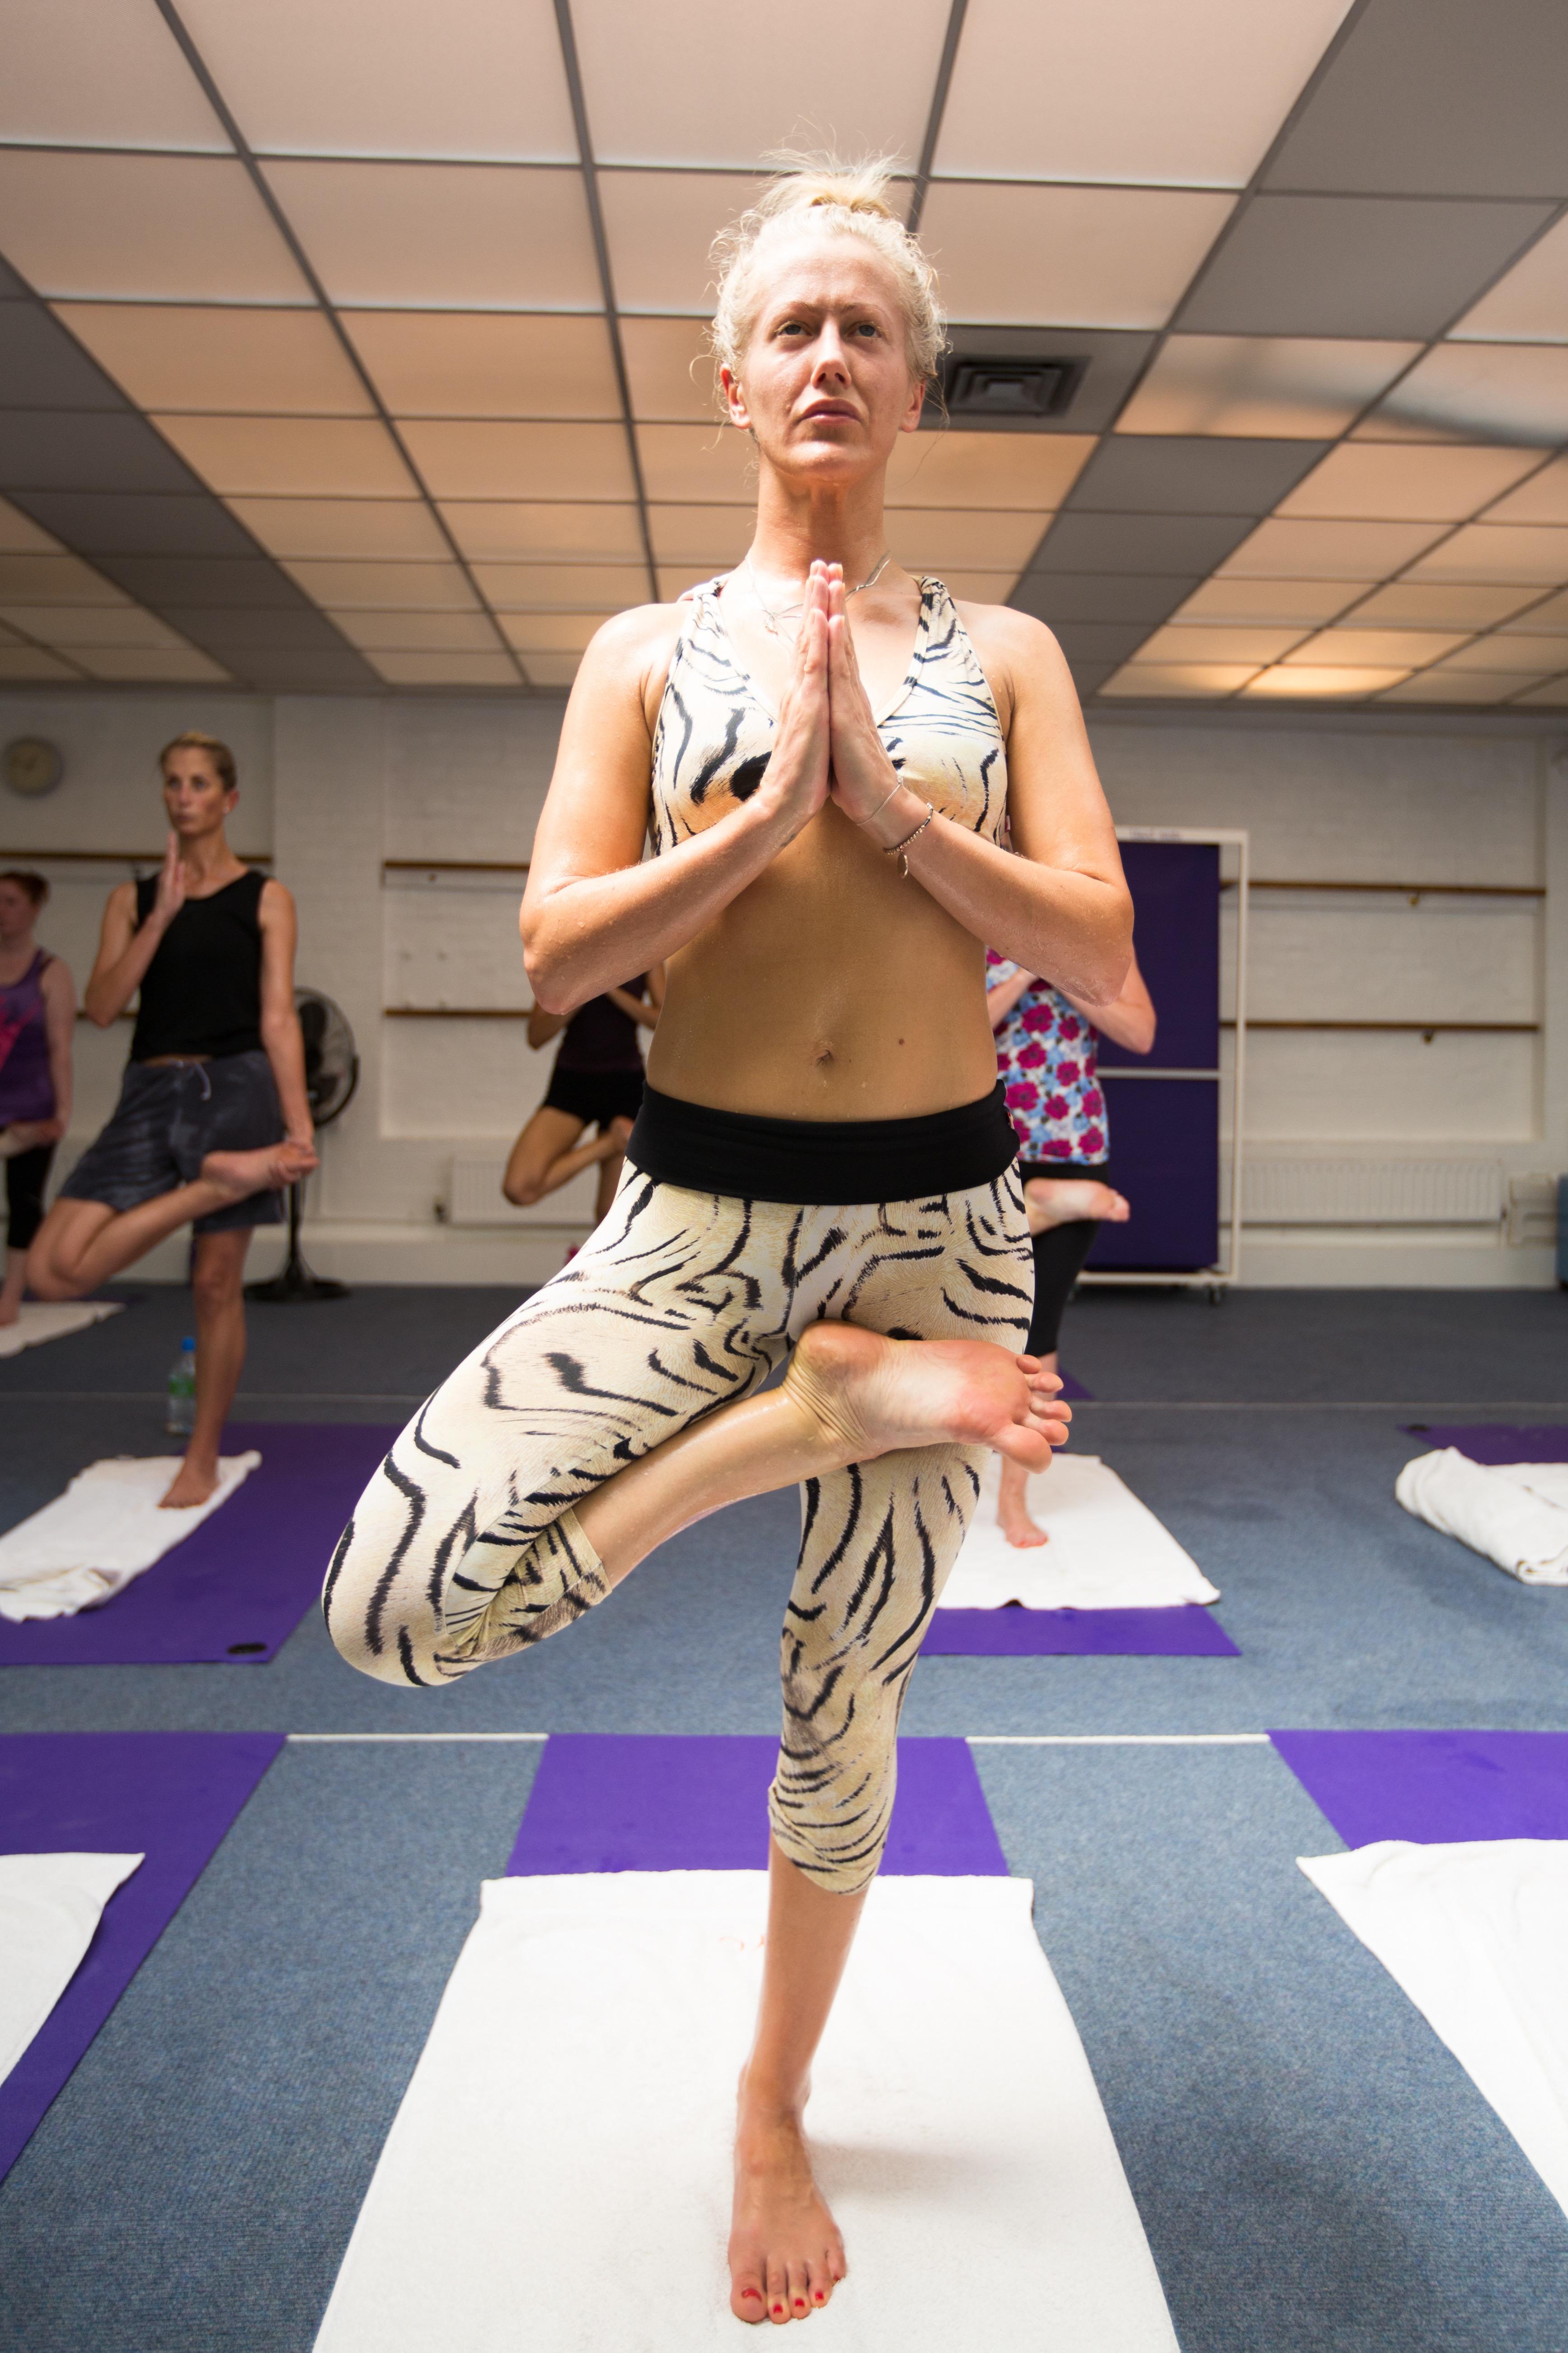 bikram-yoga_17-8-2012_144